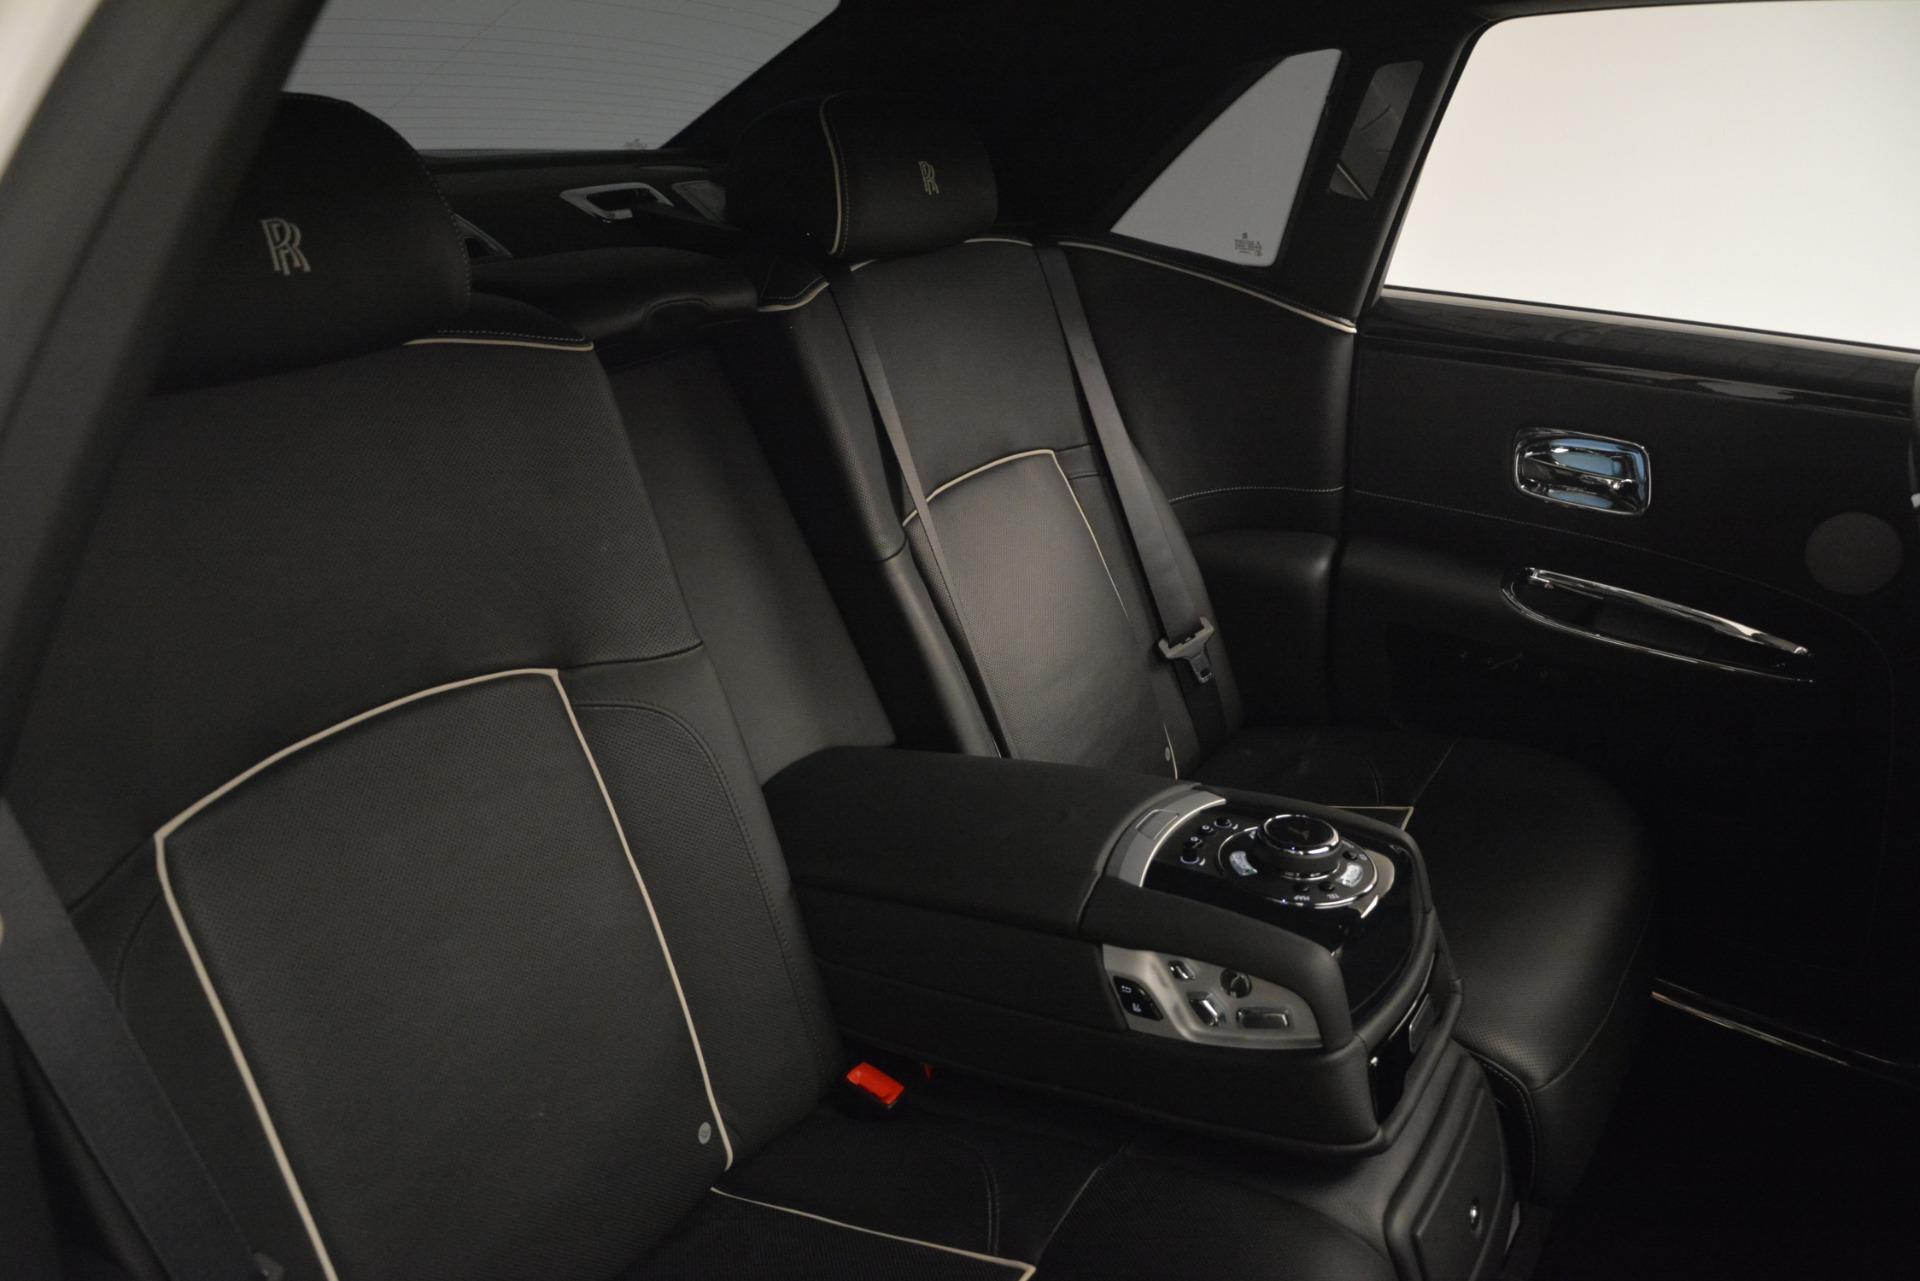 Used 2014 Rolls-Royce Ghost V-Spec For Sale In Westport, CT 2989_p28